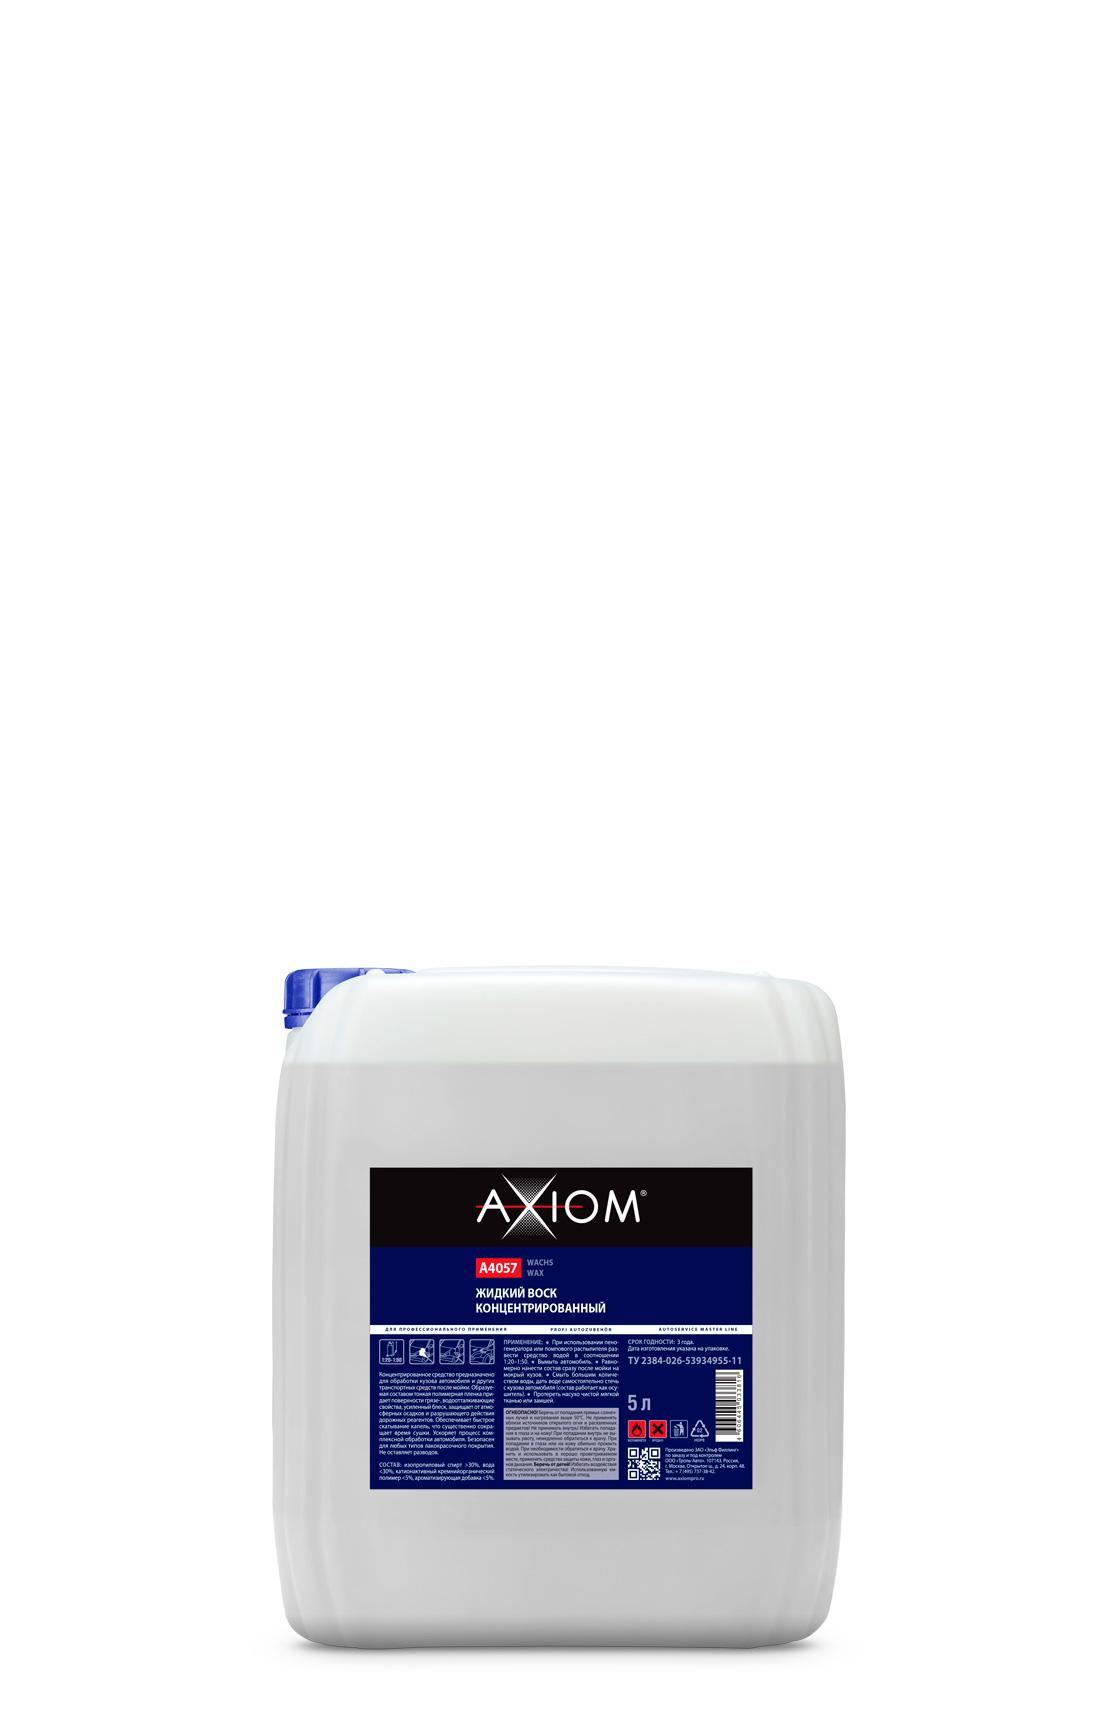 A4057_liquid_wax_5l